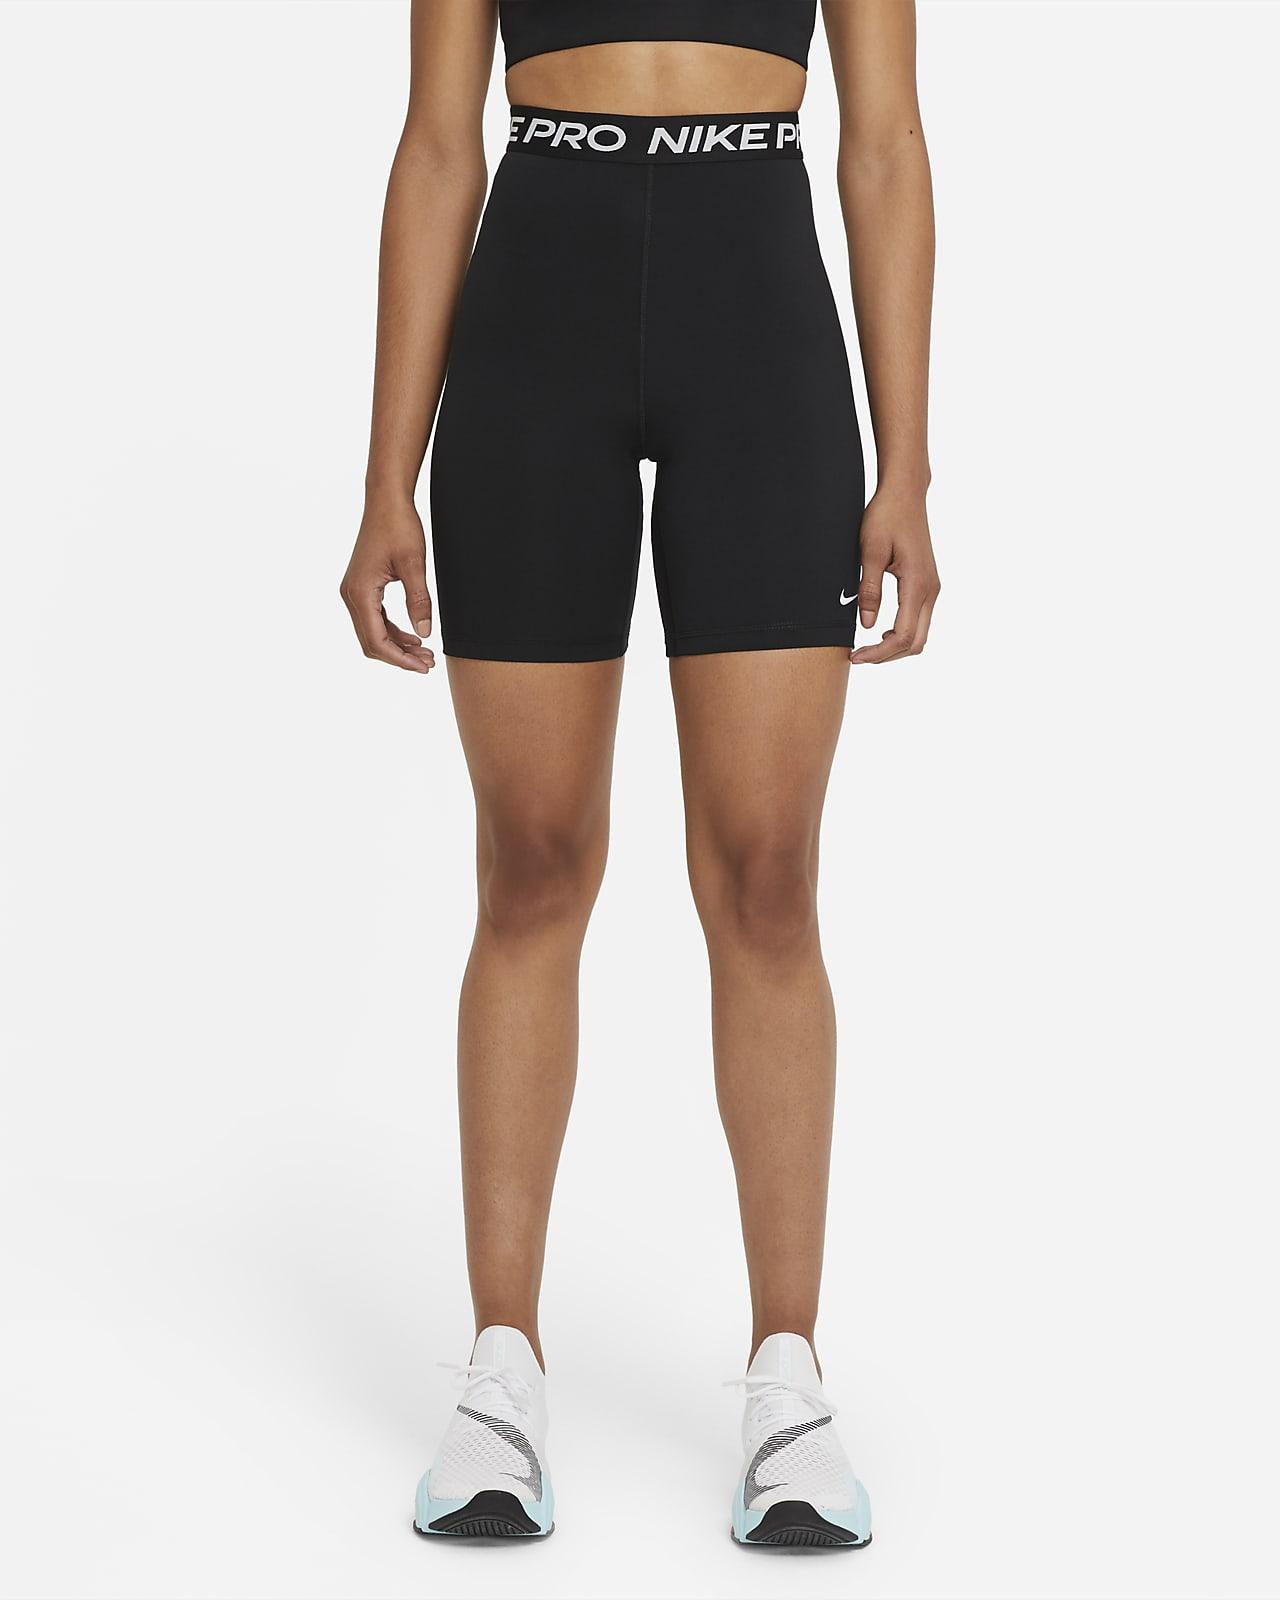 Nike Pro 365 Women's High-Rise 18cm (approx.) Shorts